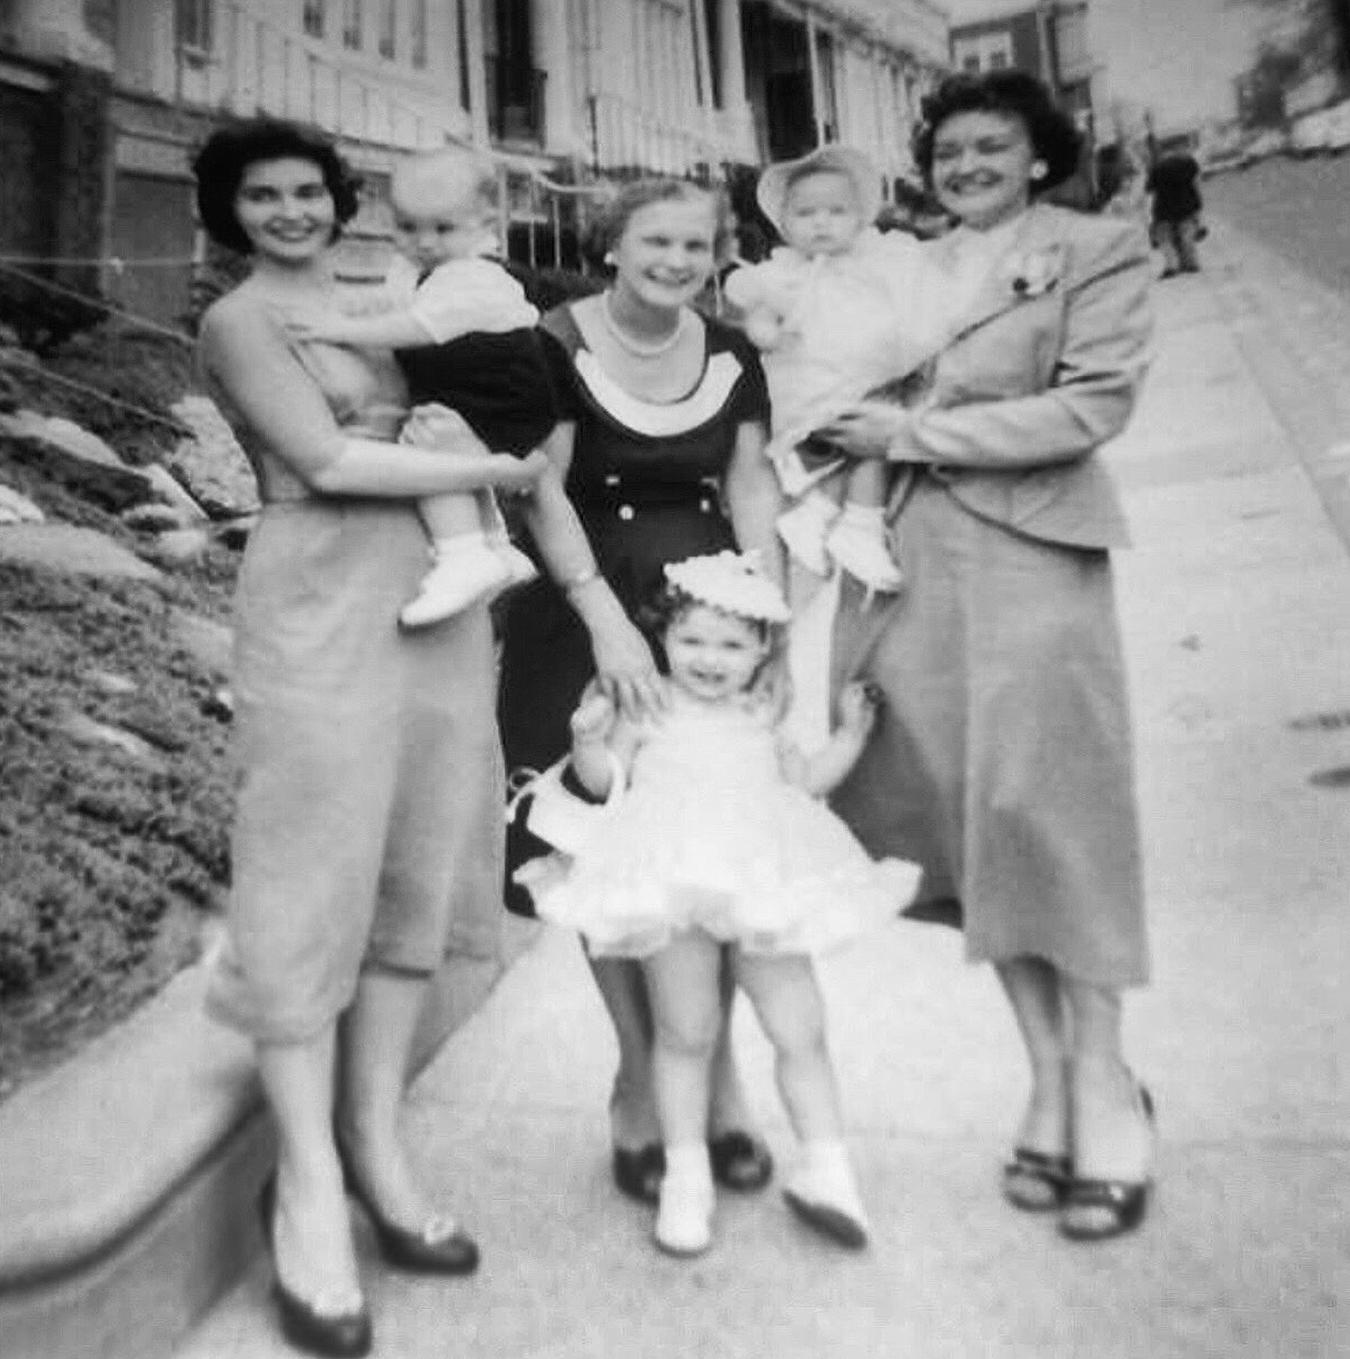 Katie_kerl_mom_hospital_walker_family_love_history_babies